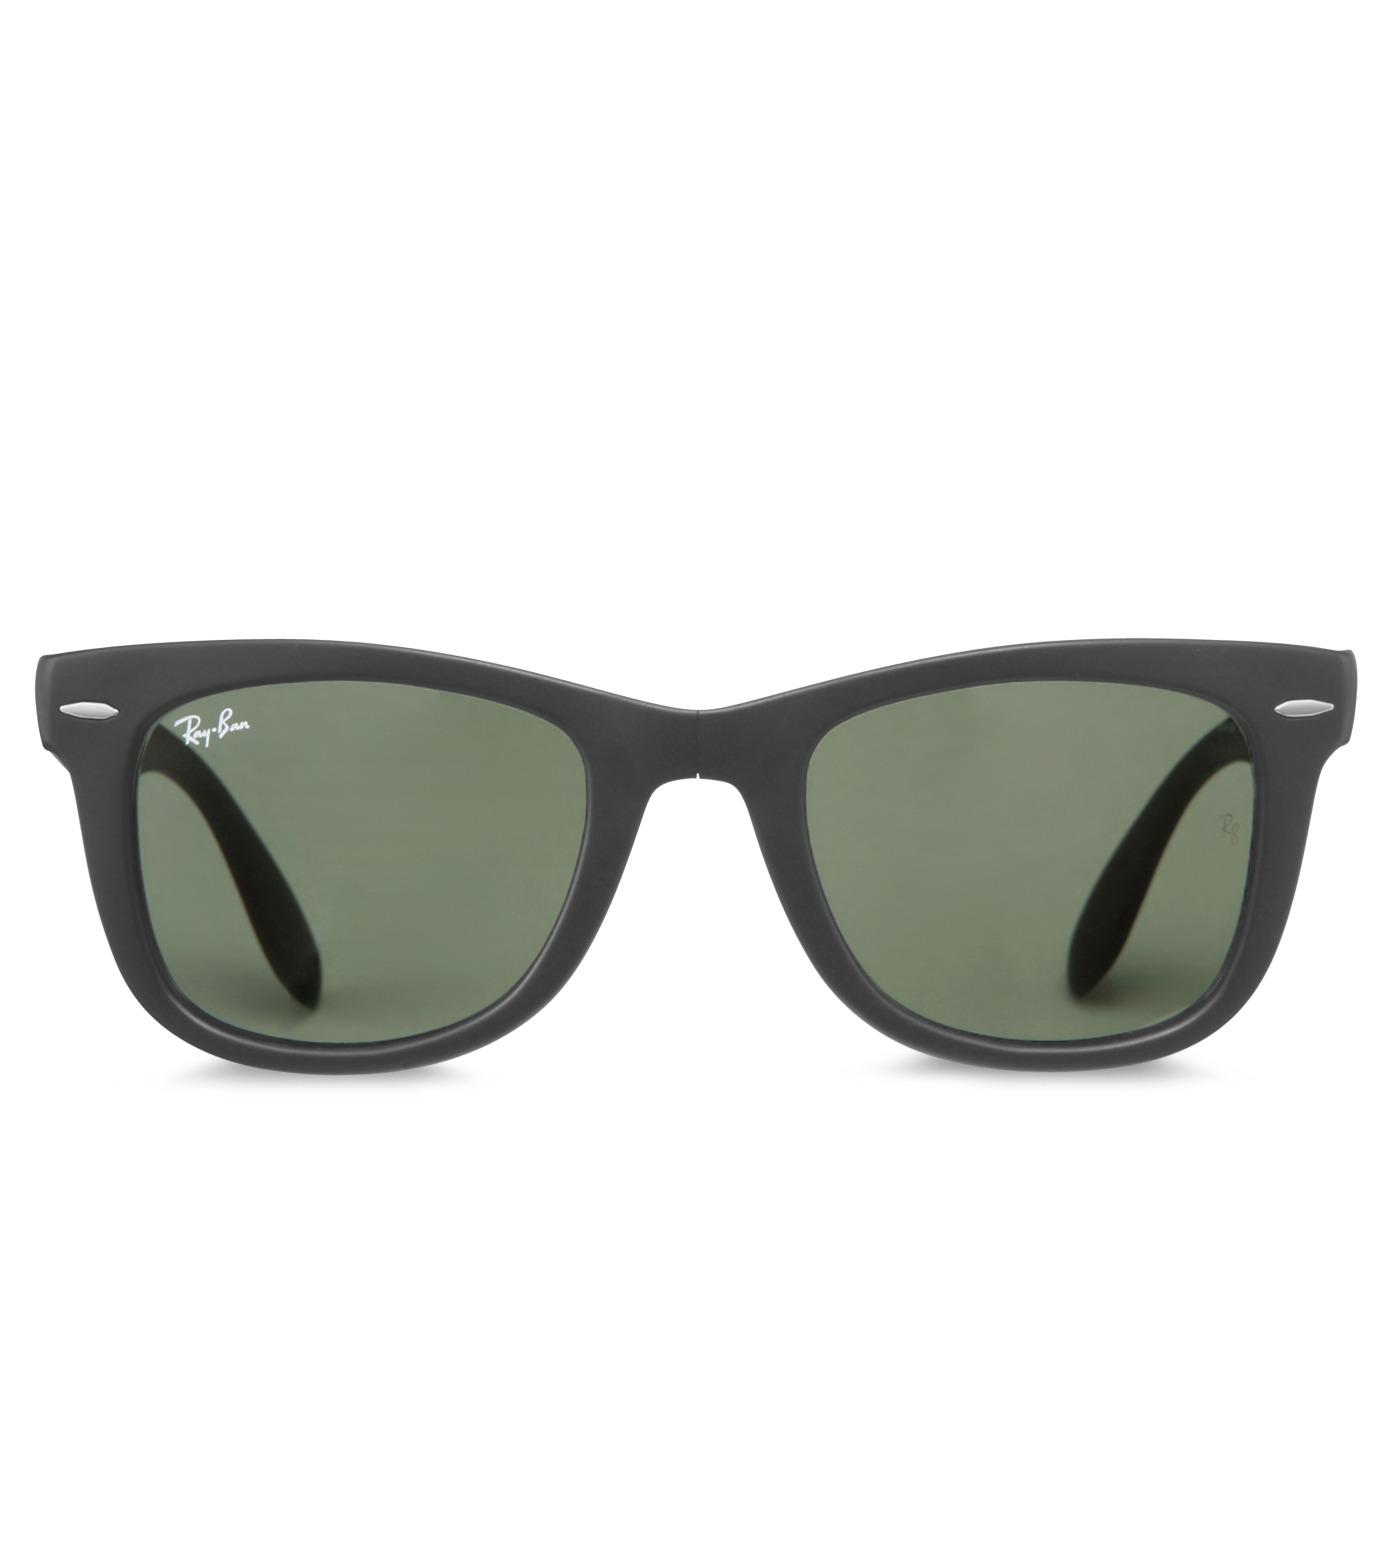 Ray-Ban(レイバン)のWayfarer Matte Black-CHARCHOL GRAY(アイウェア/eyewear)-BR-4105-12 拡大詳細画像3